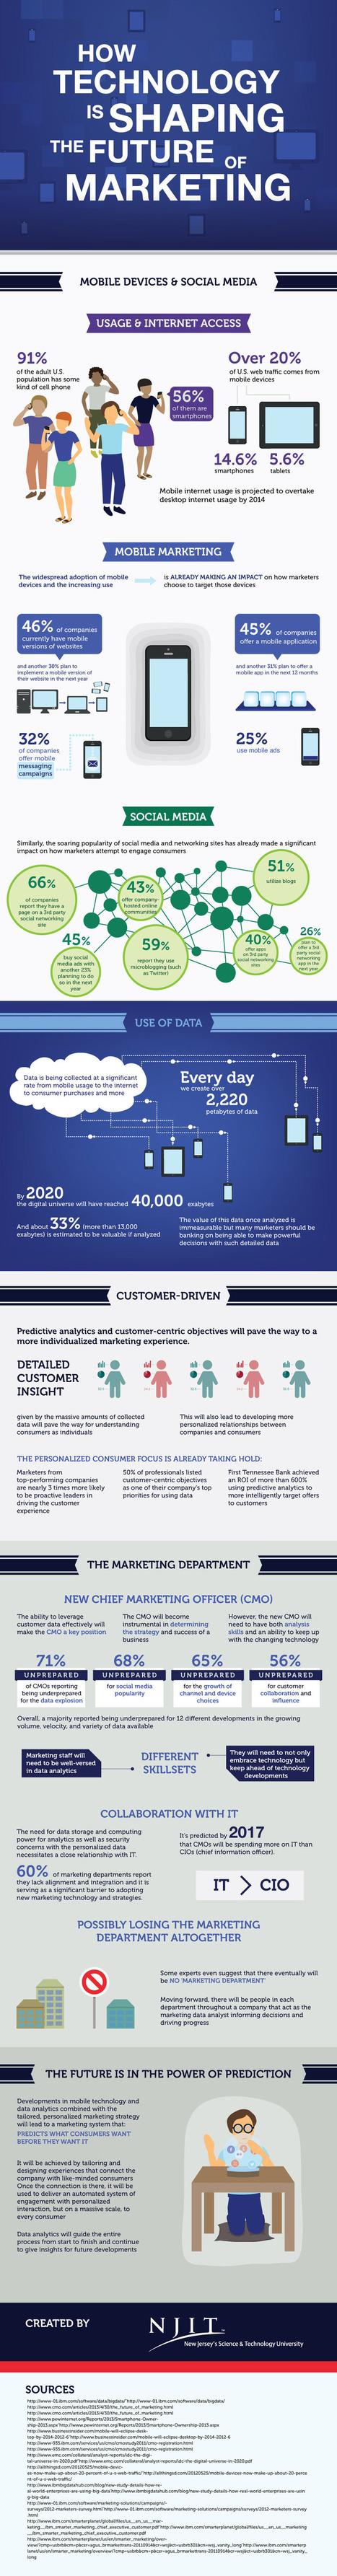 1395076175-win-marketing-scrap-marketing-department-hire-data-geek-infographic.jpg (842x6438 pixels) | Changing face of Retail | Scoop.it